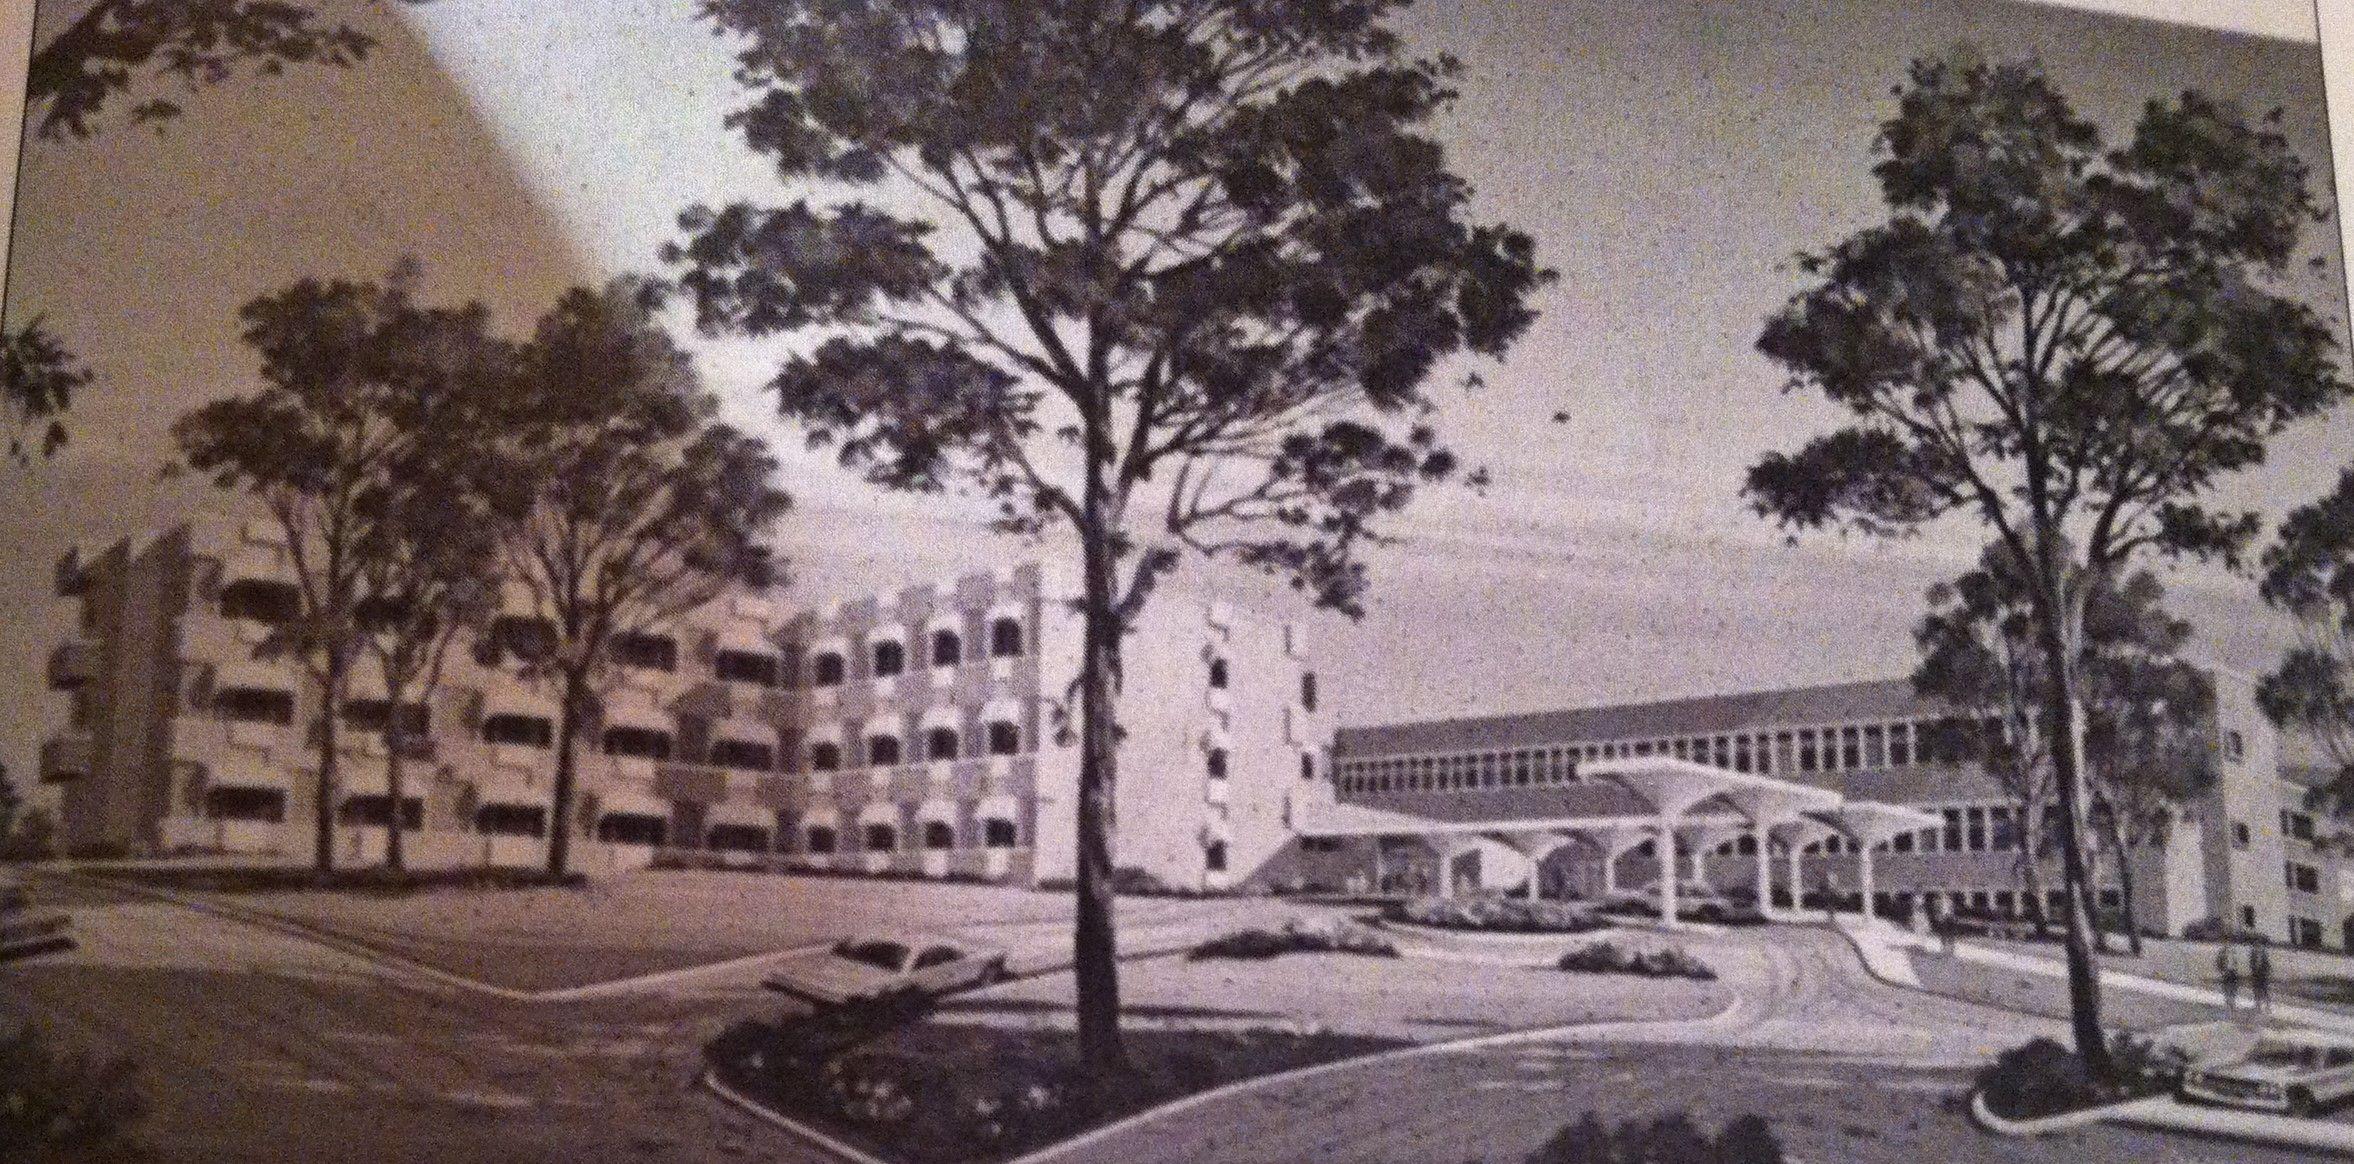 Flow Memorial Hospital 1310 Scripture Street Denton was original